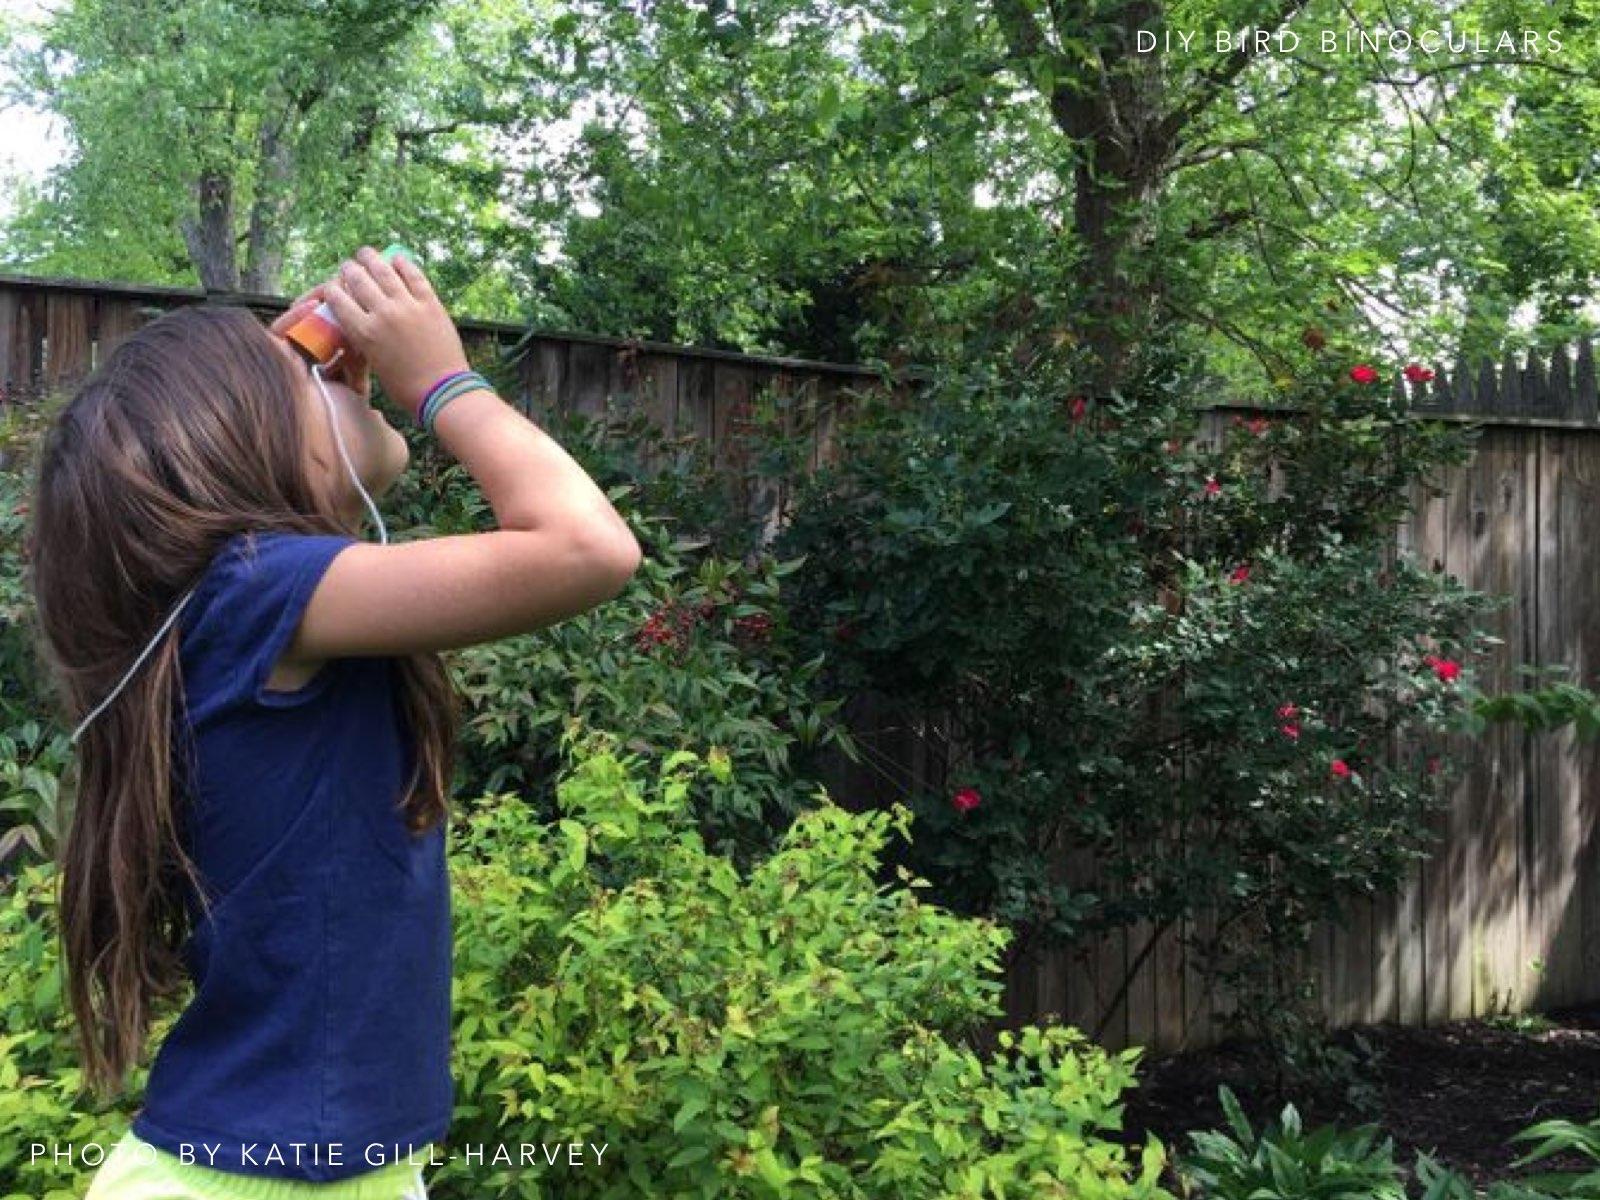 diy binoculars - (cool) progeny